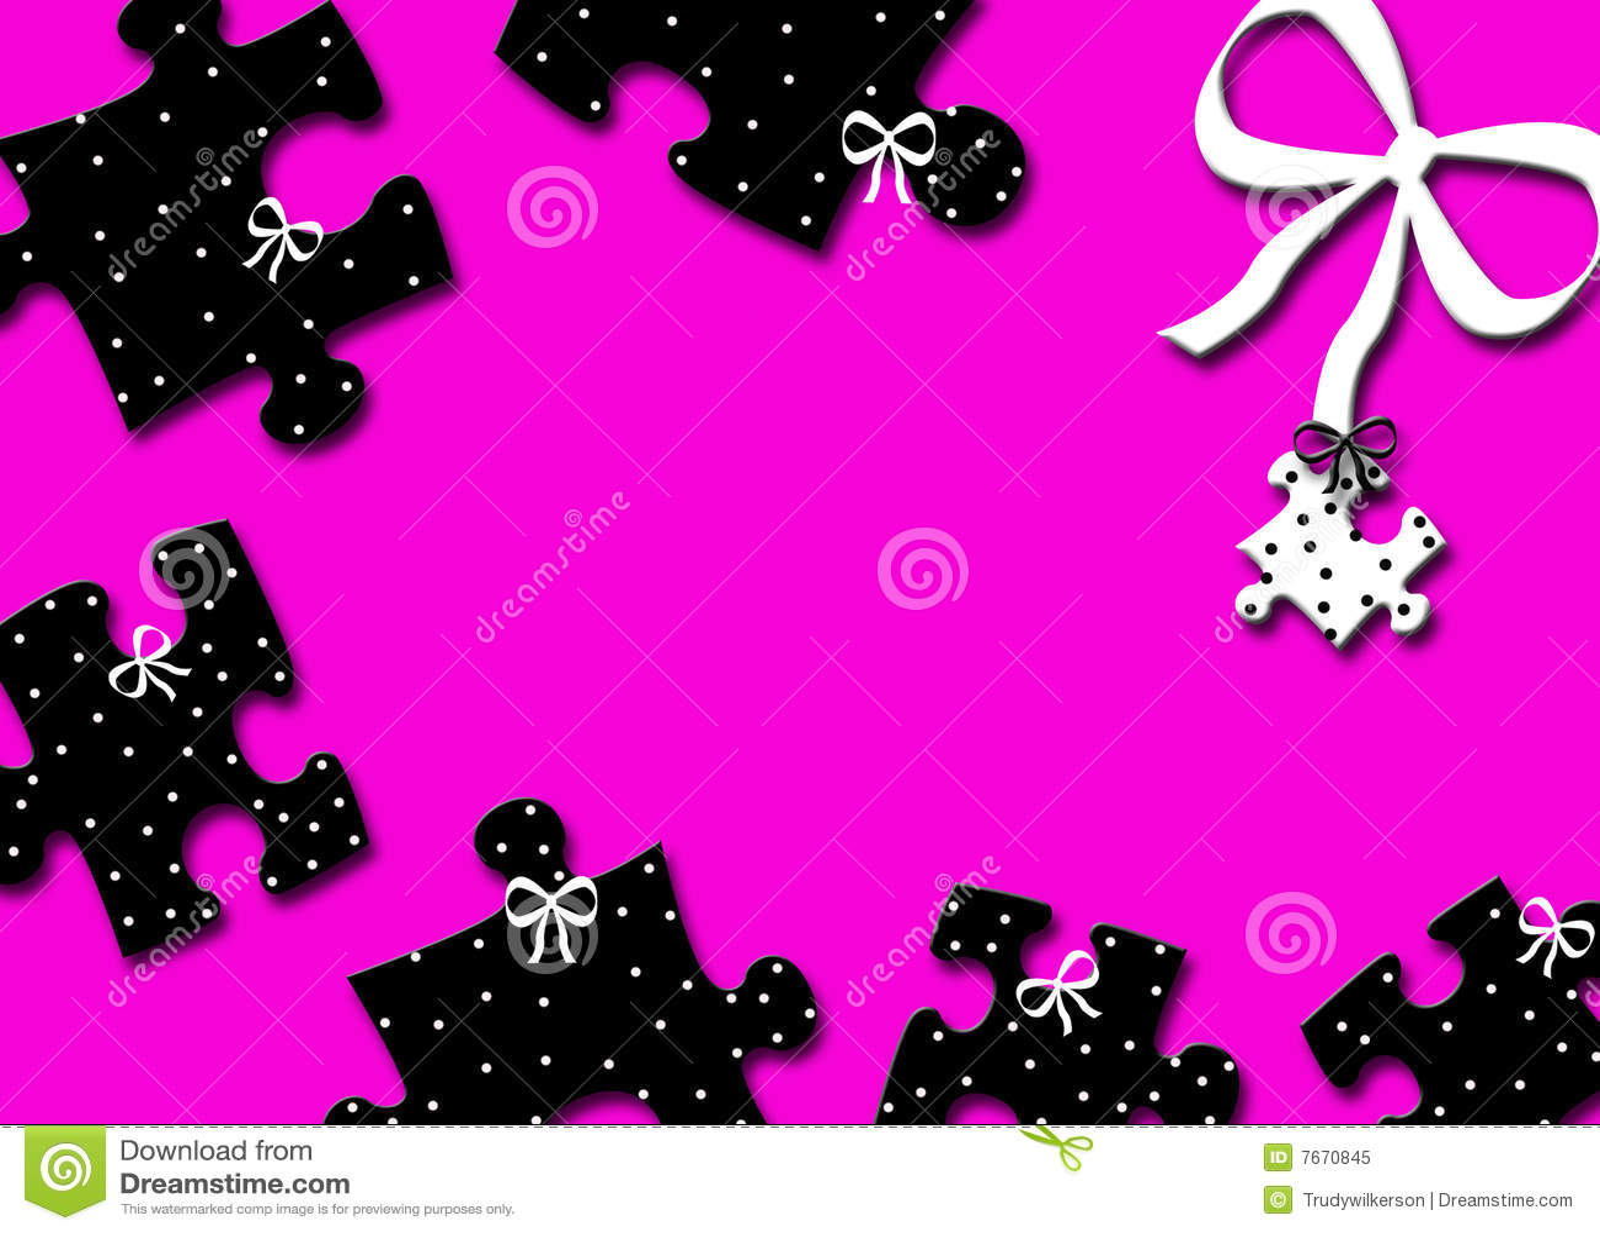 Girly Background Royalty Free Stock Photo